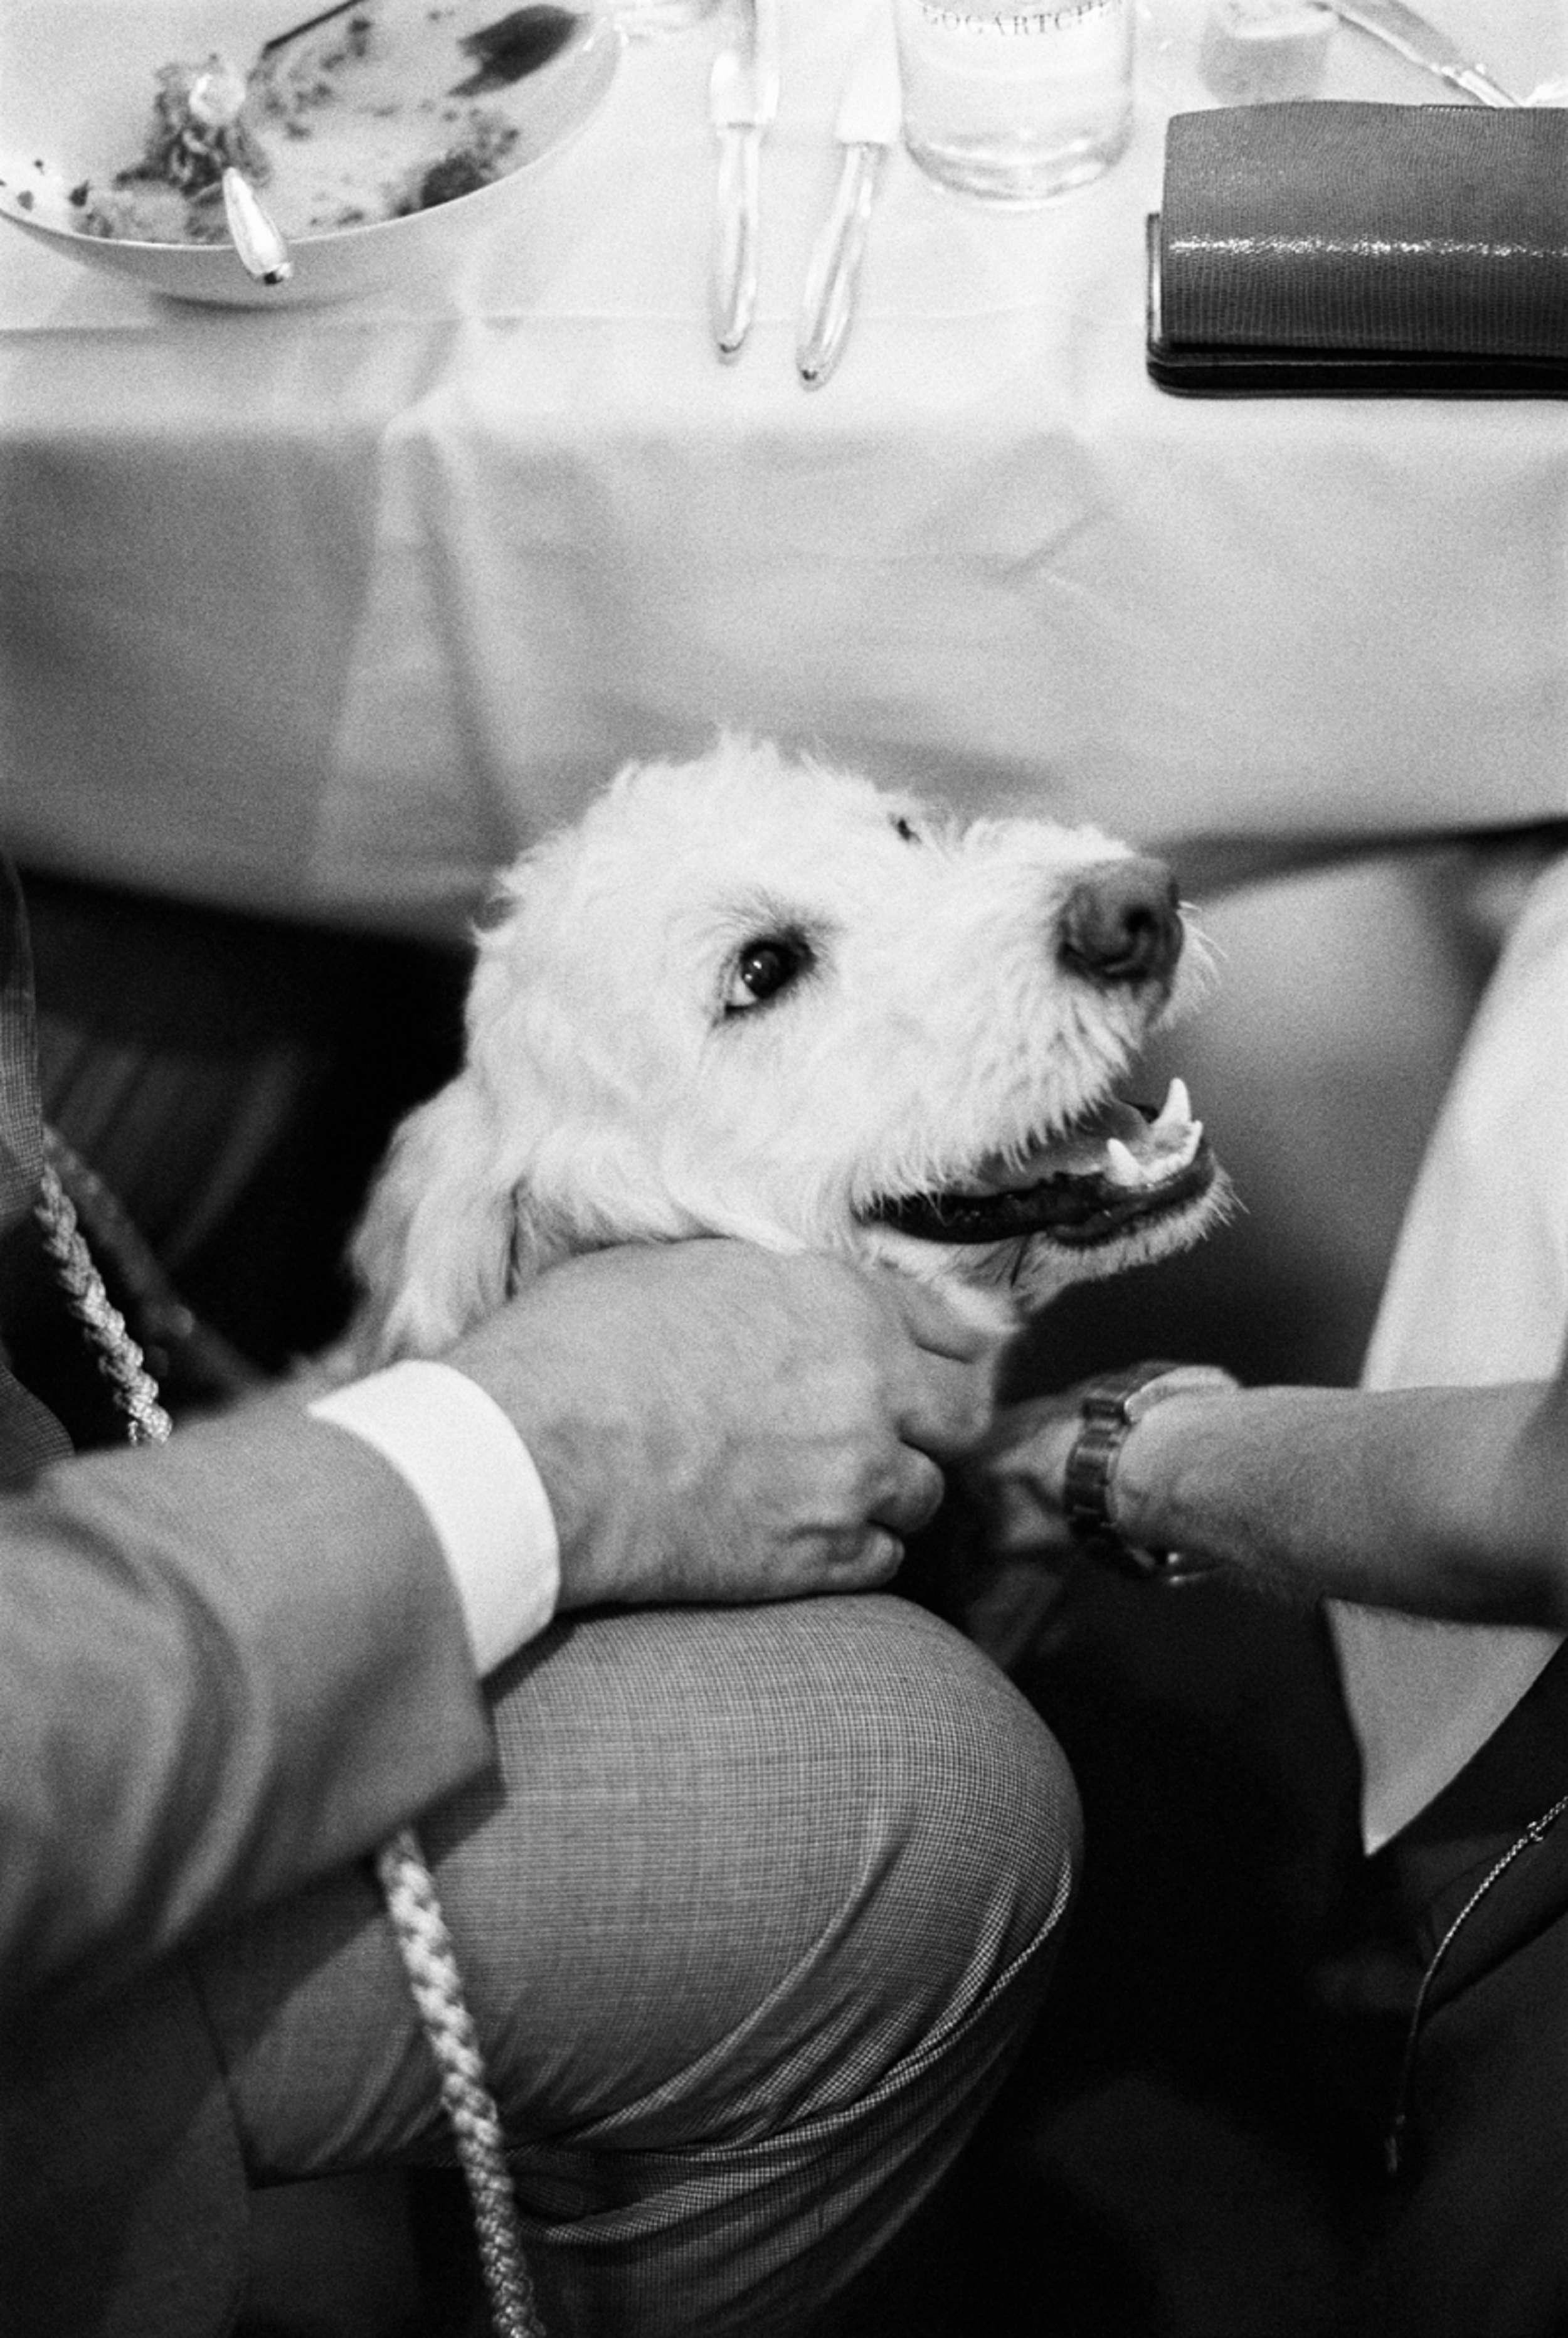 dog with bride and groom under table at wedding Hund Hochzeit